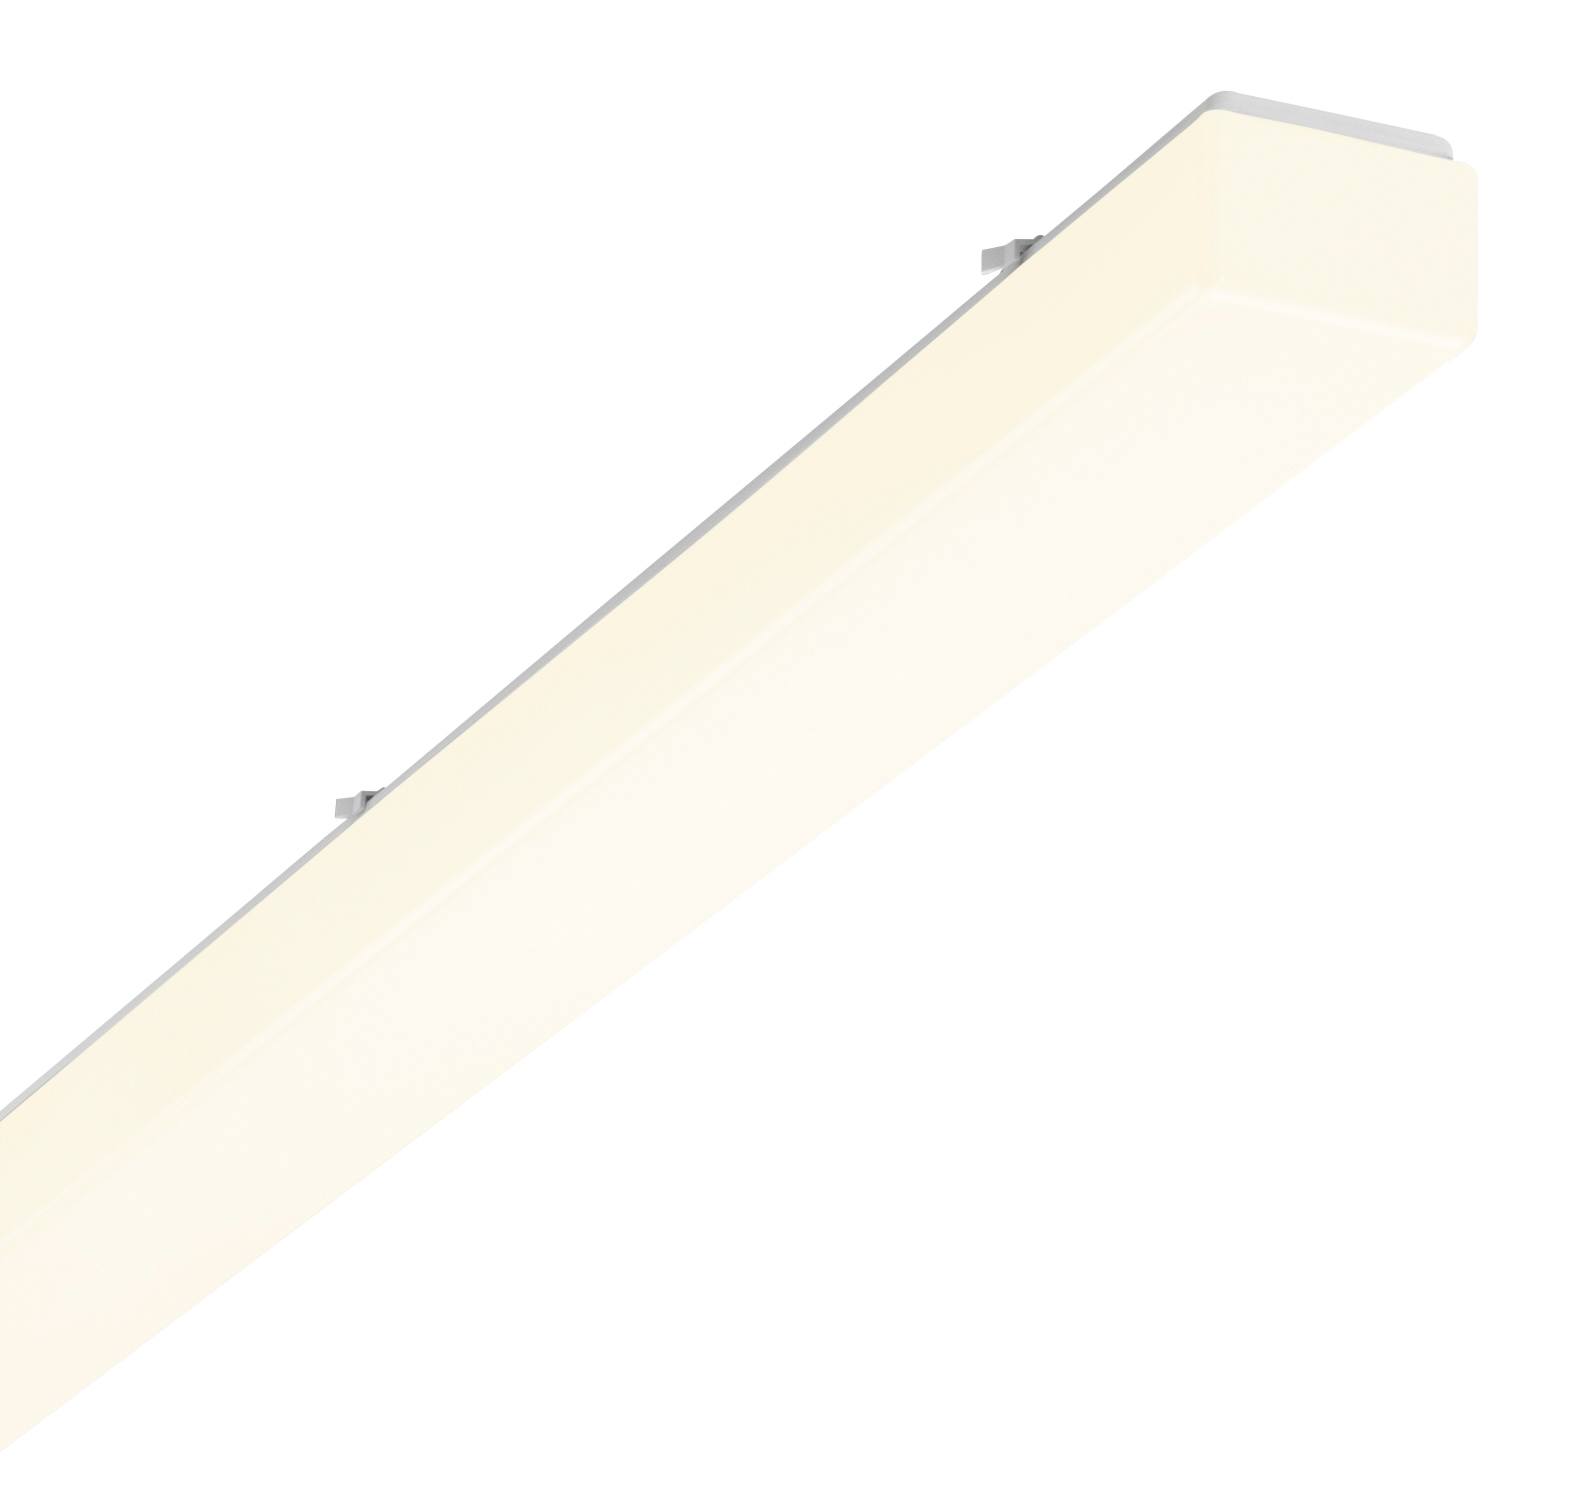 1 Stk AOT-O LED Wannenleuchte, 25W, 3000K, IP50, acryl, opal, Weiß LI70101962